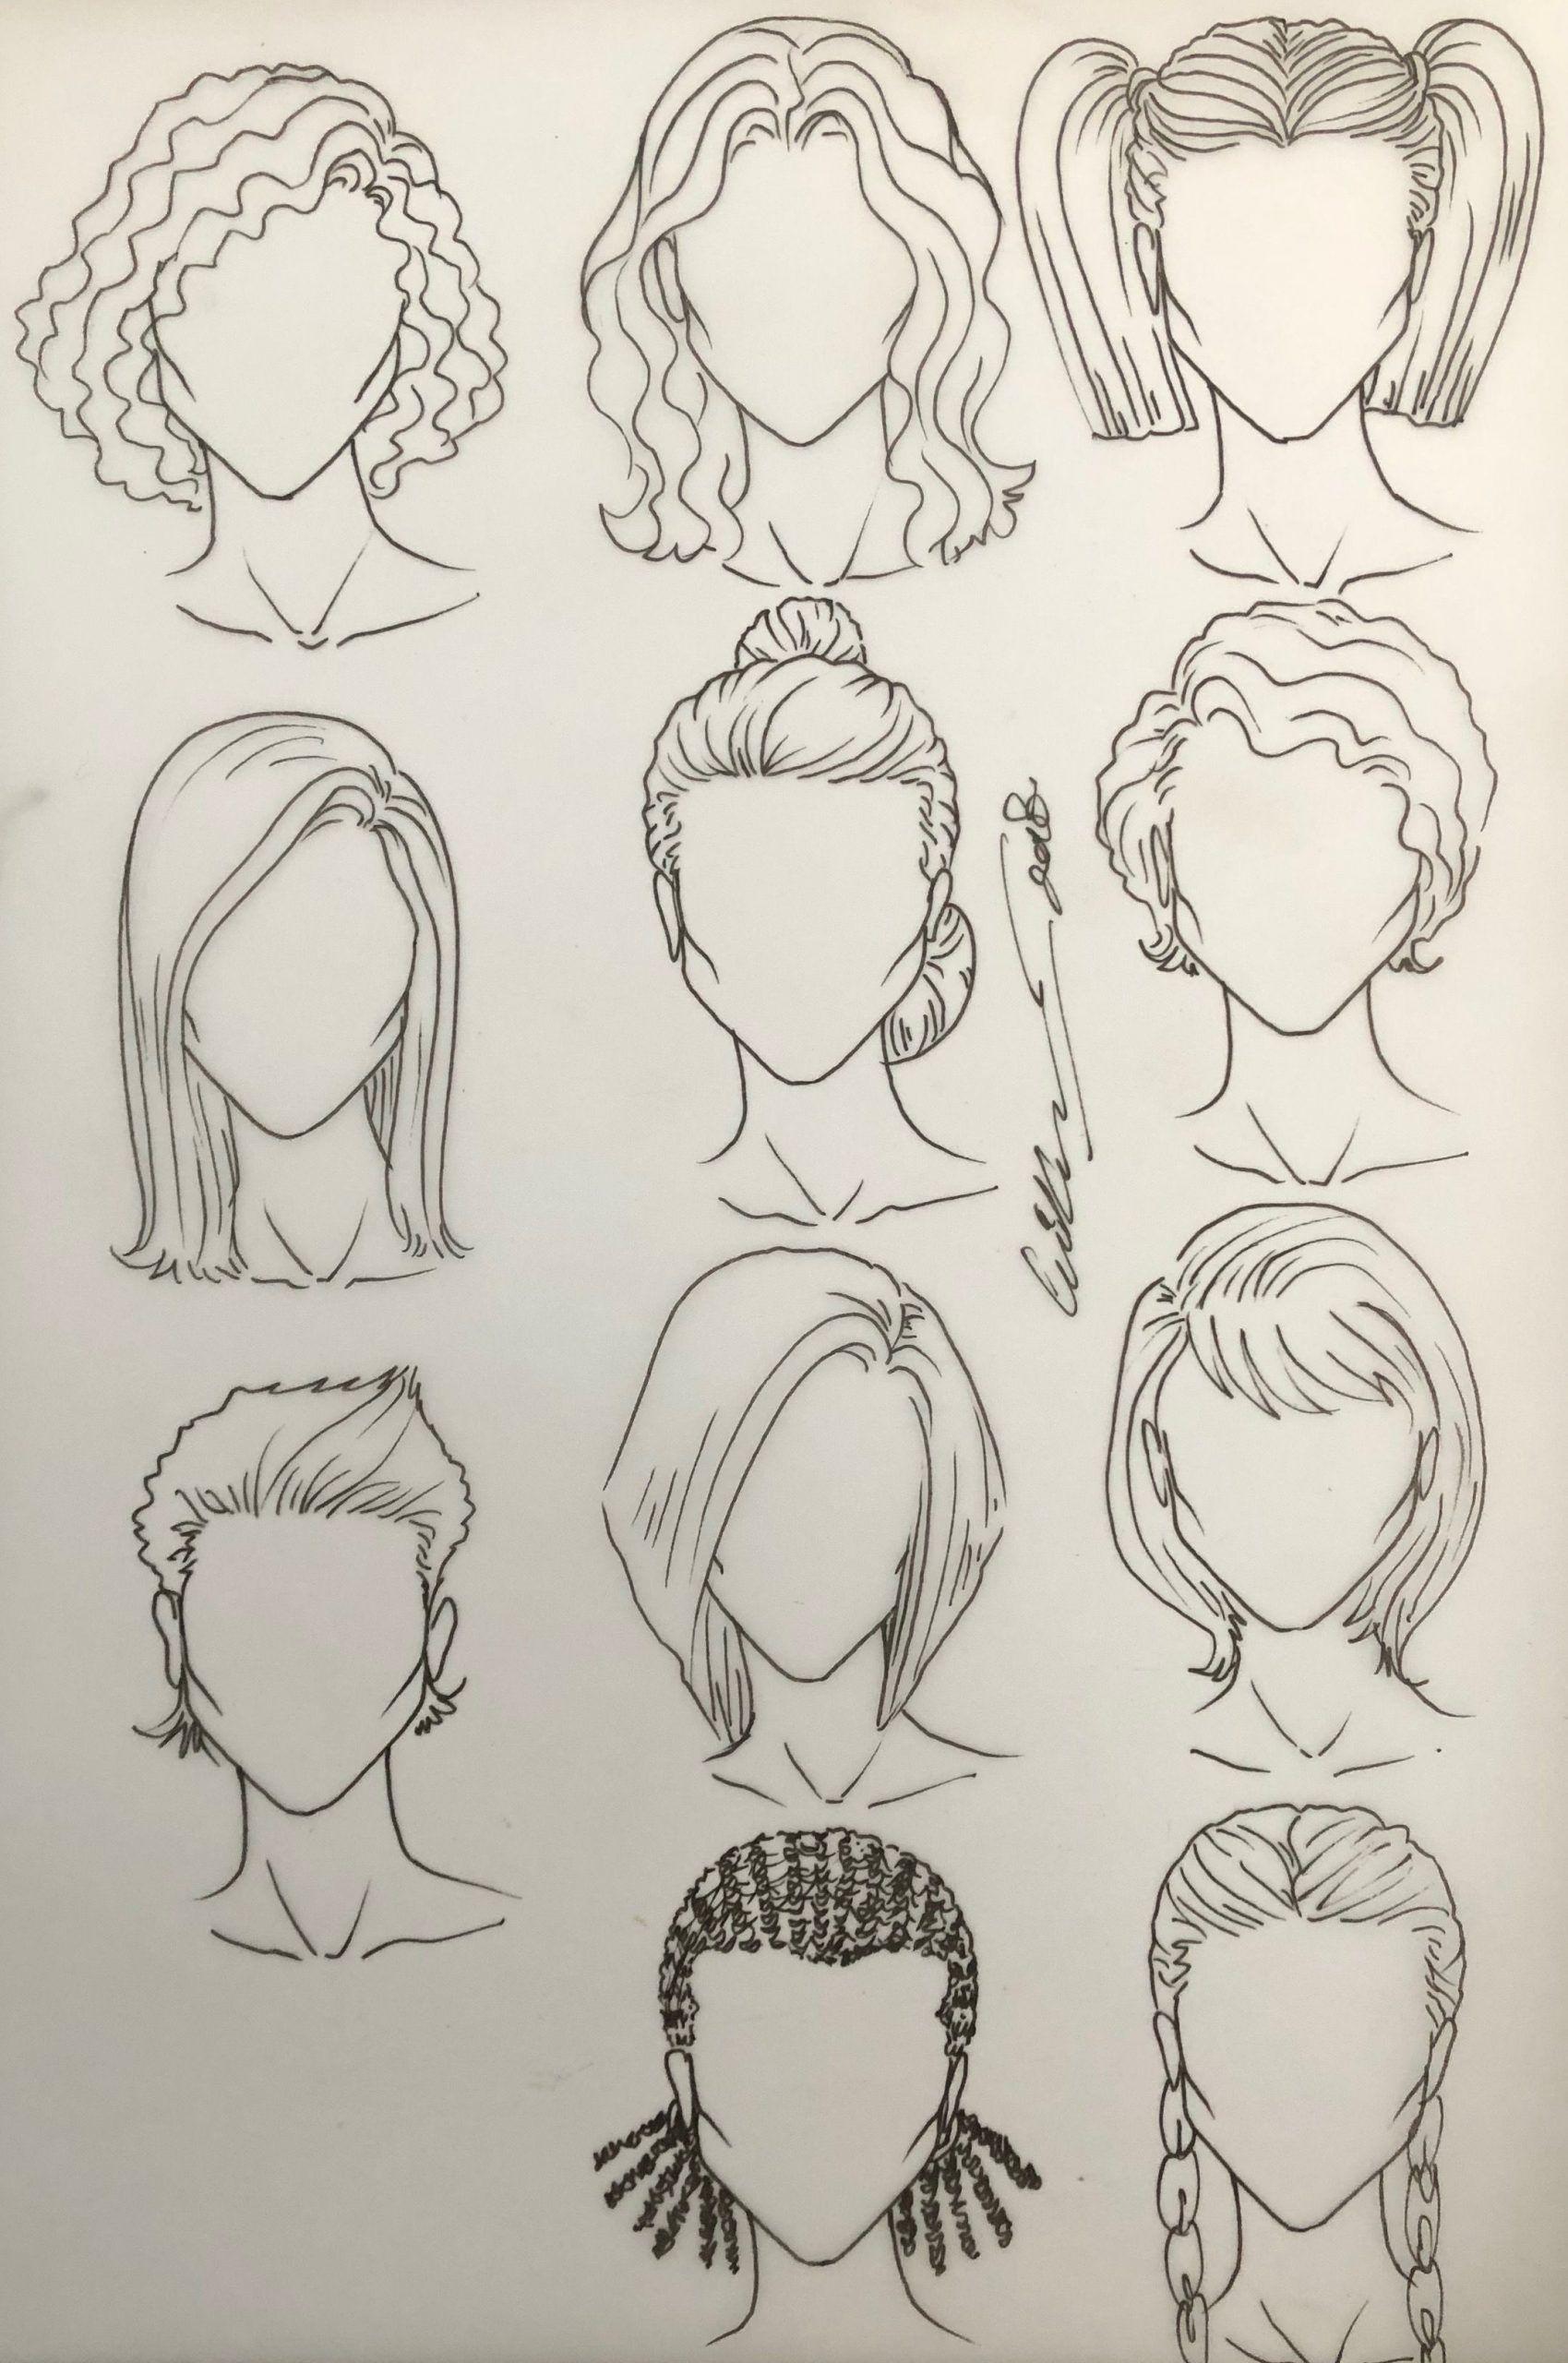 Paintings Model Drawing Top Model Drawing Hair Drawing Hair From The Side Edges Drawing Hair Dra In 2020 Fashion Illustration Hair Hair Sketch Hair Illustration